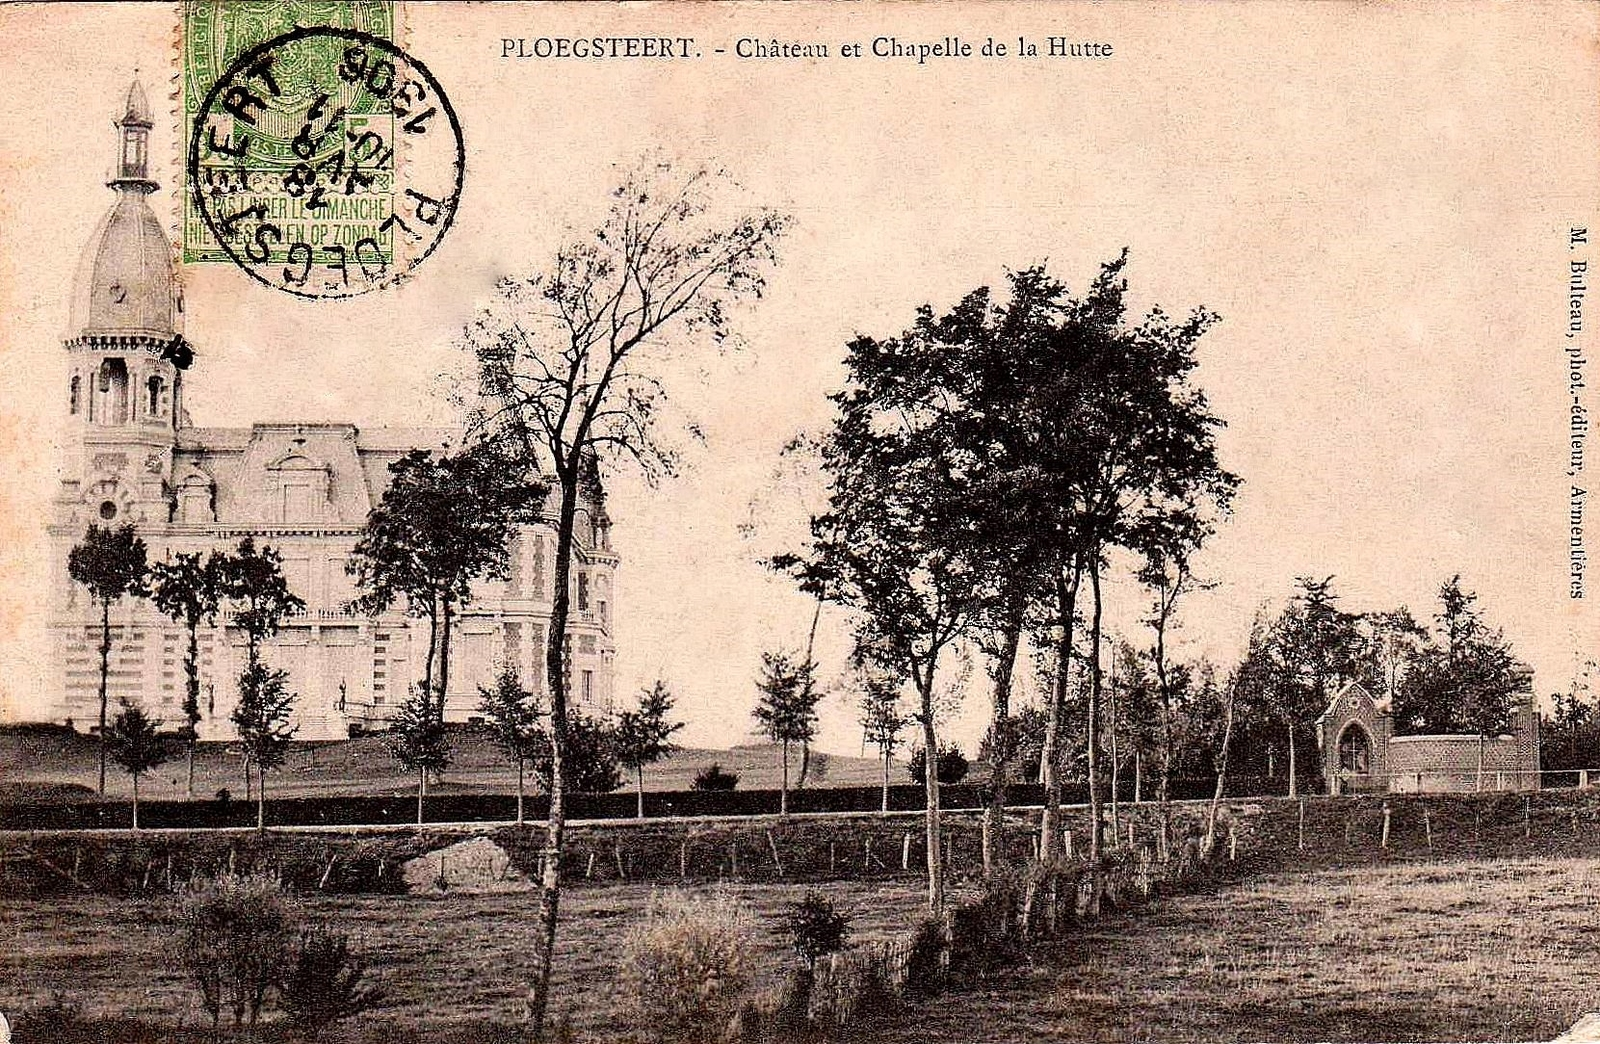 "Ploegsteert - Ploegsteert "" Chateau et Chapelle de la Hutte Anno 1906 """